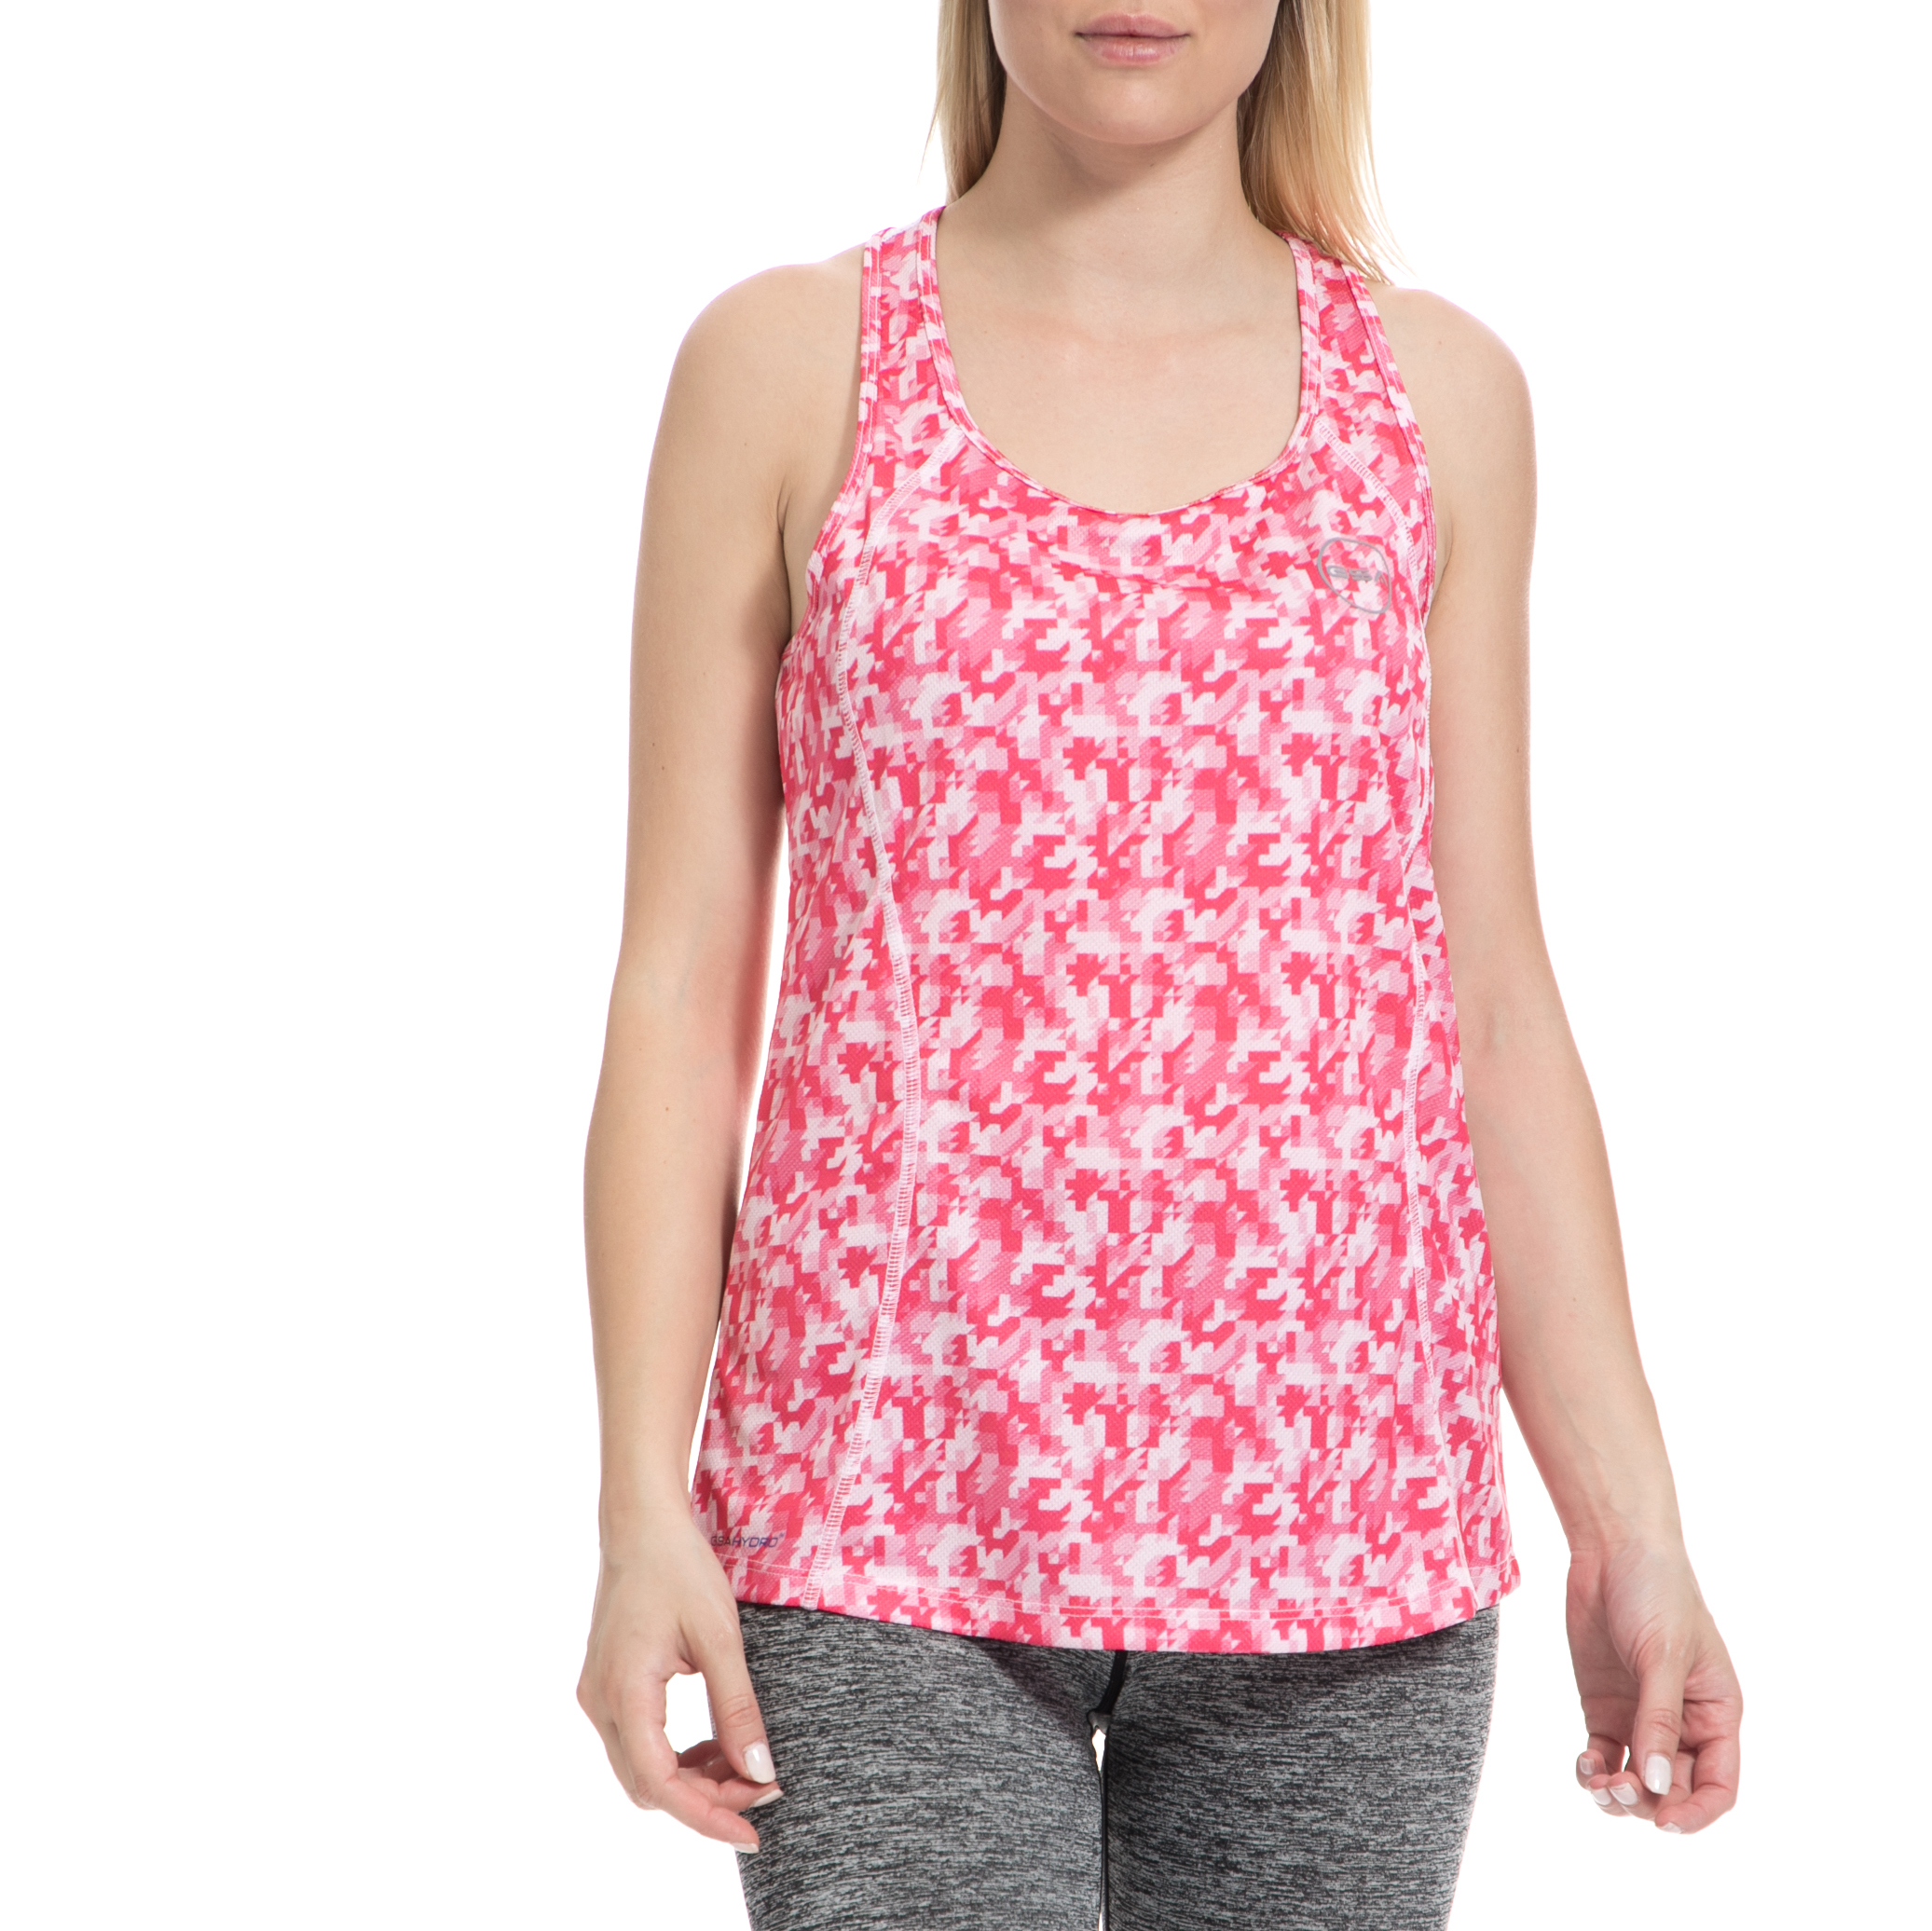 GSA – Γυναικεία μπλούζα GSA ροζ